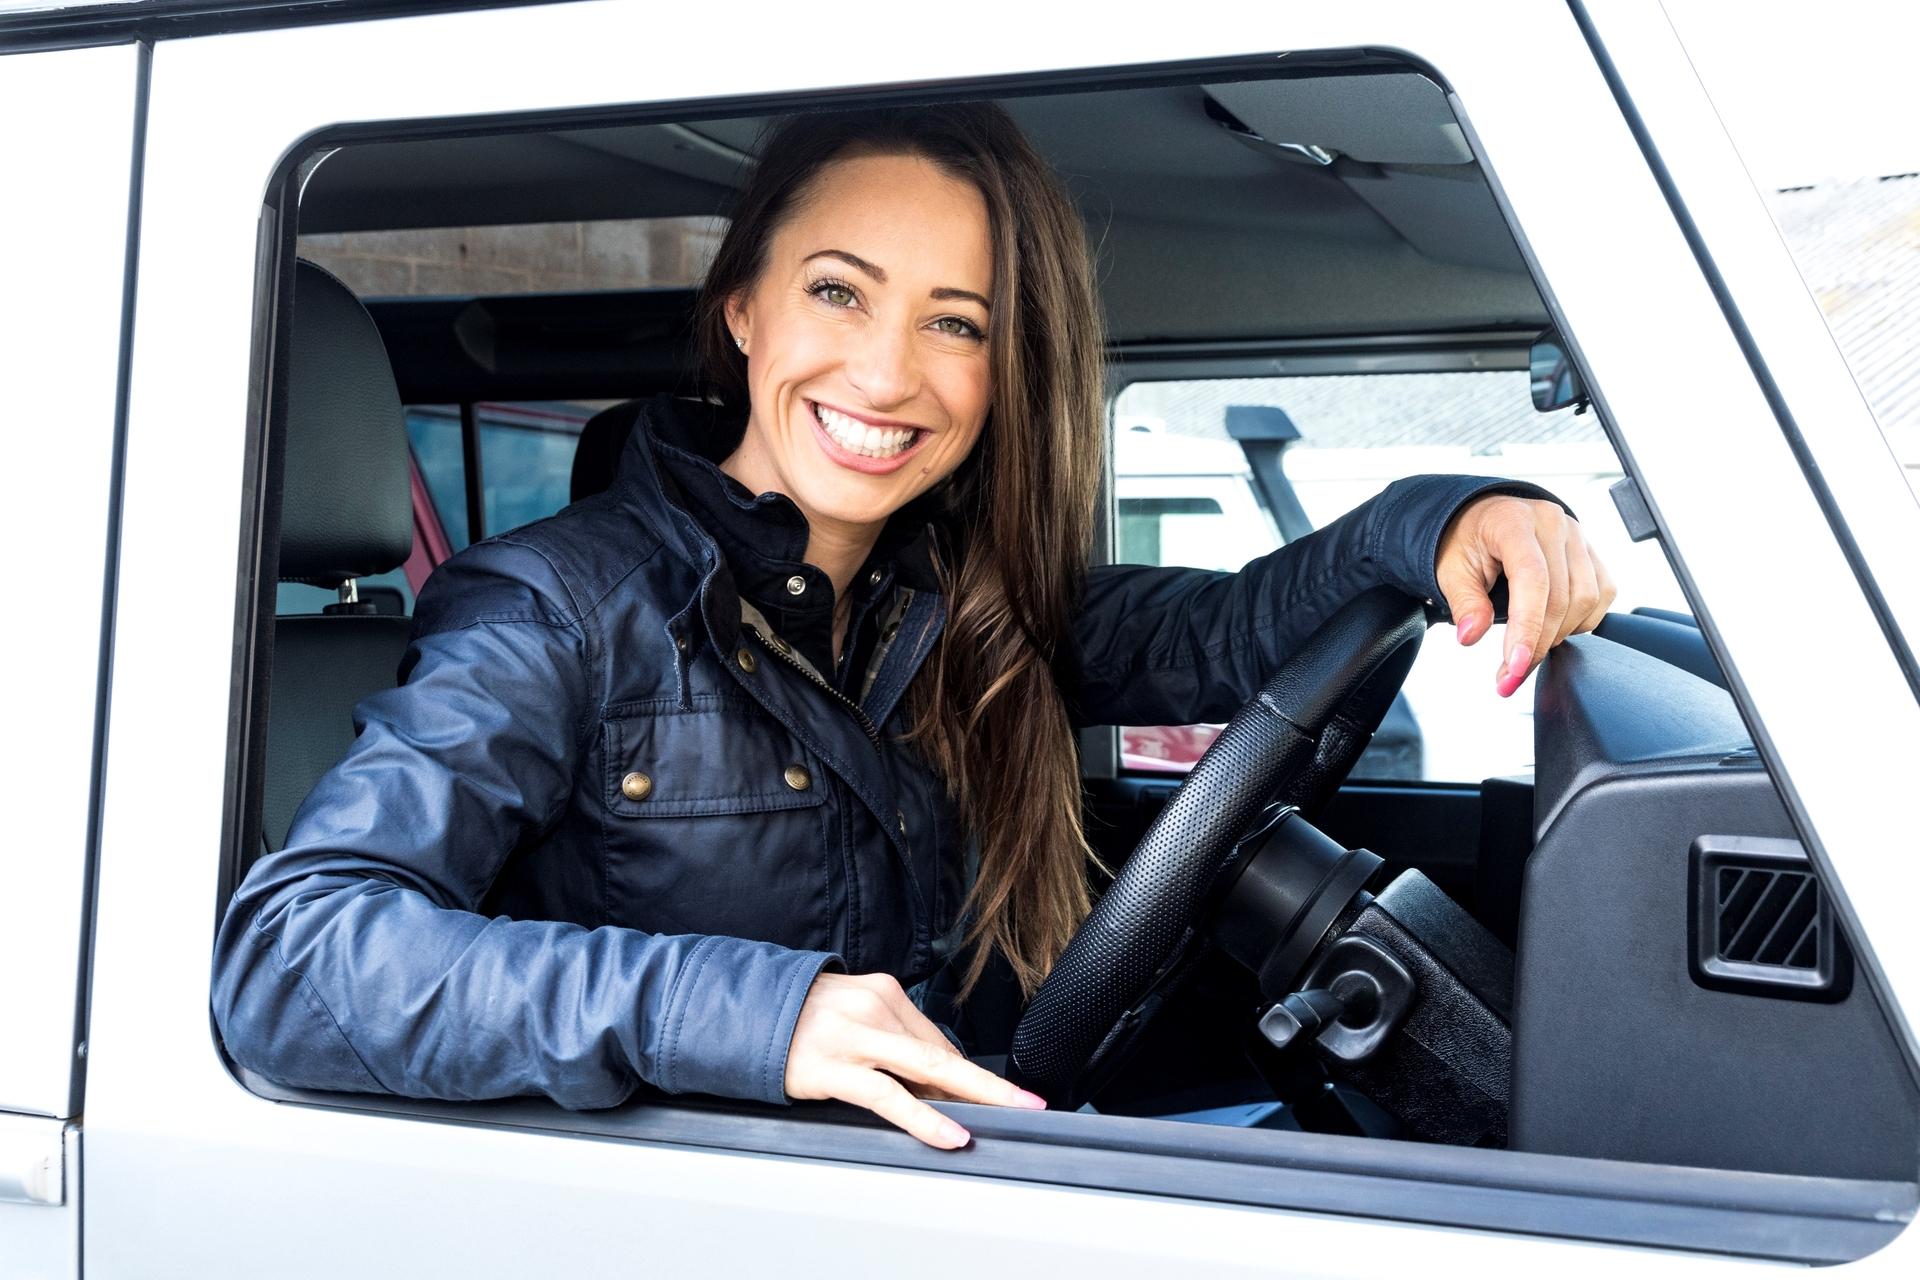 rebecca racer joins MotorEasy female consumer champion rebecca jackson